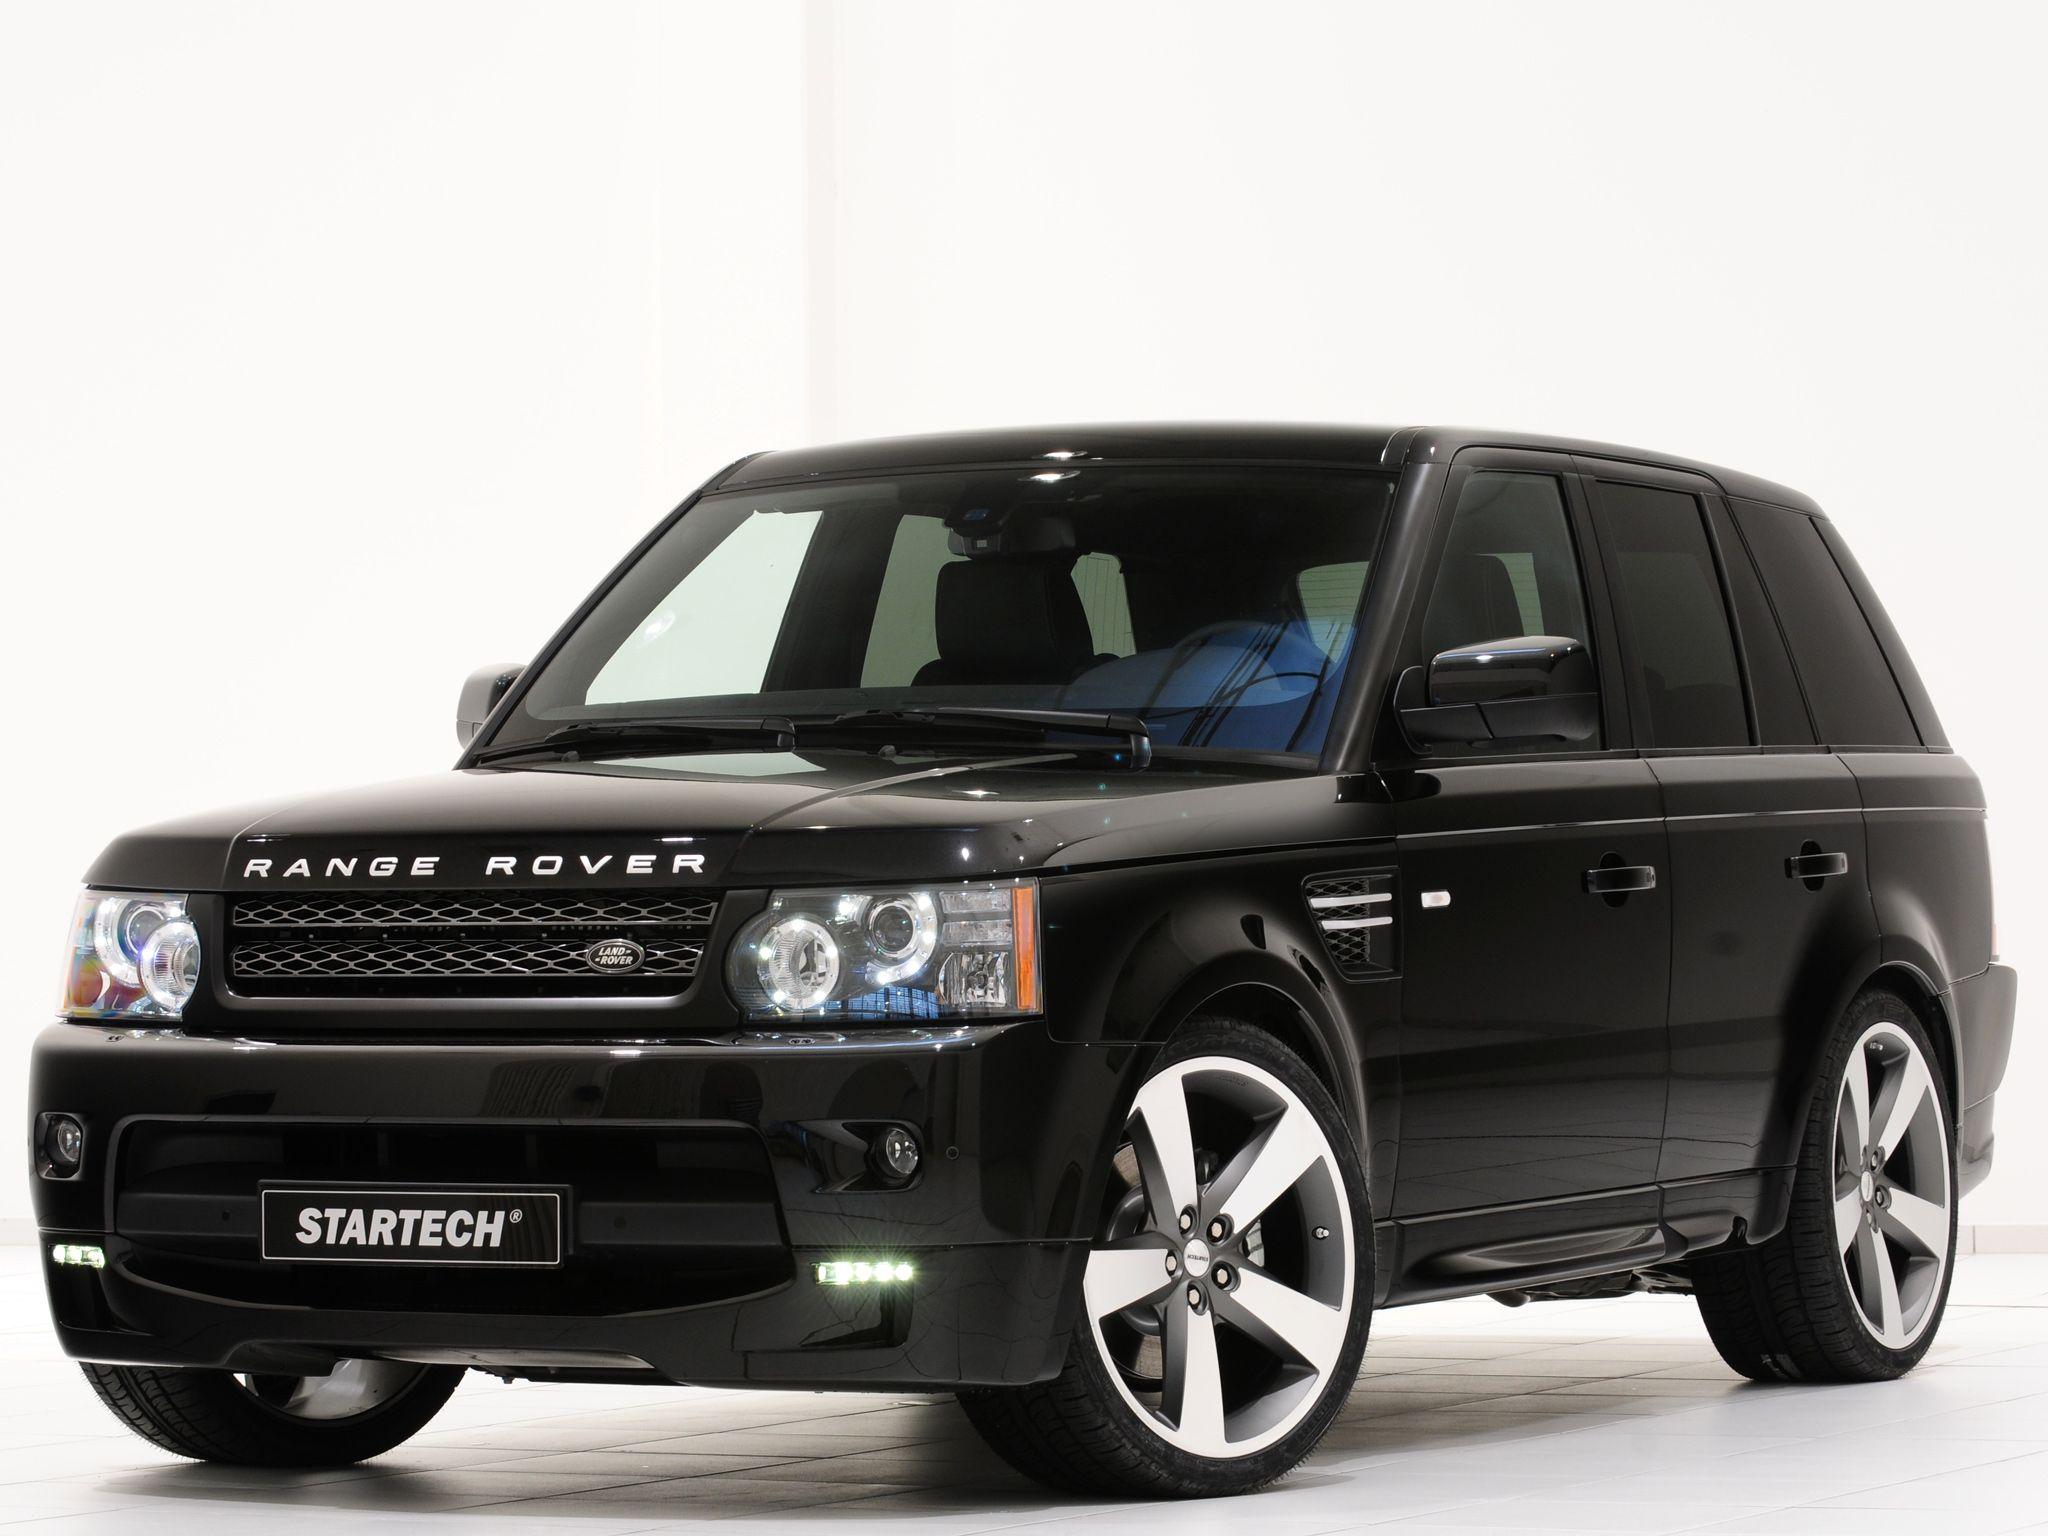 2009 Startech Range Rover